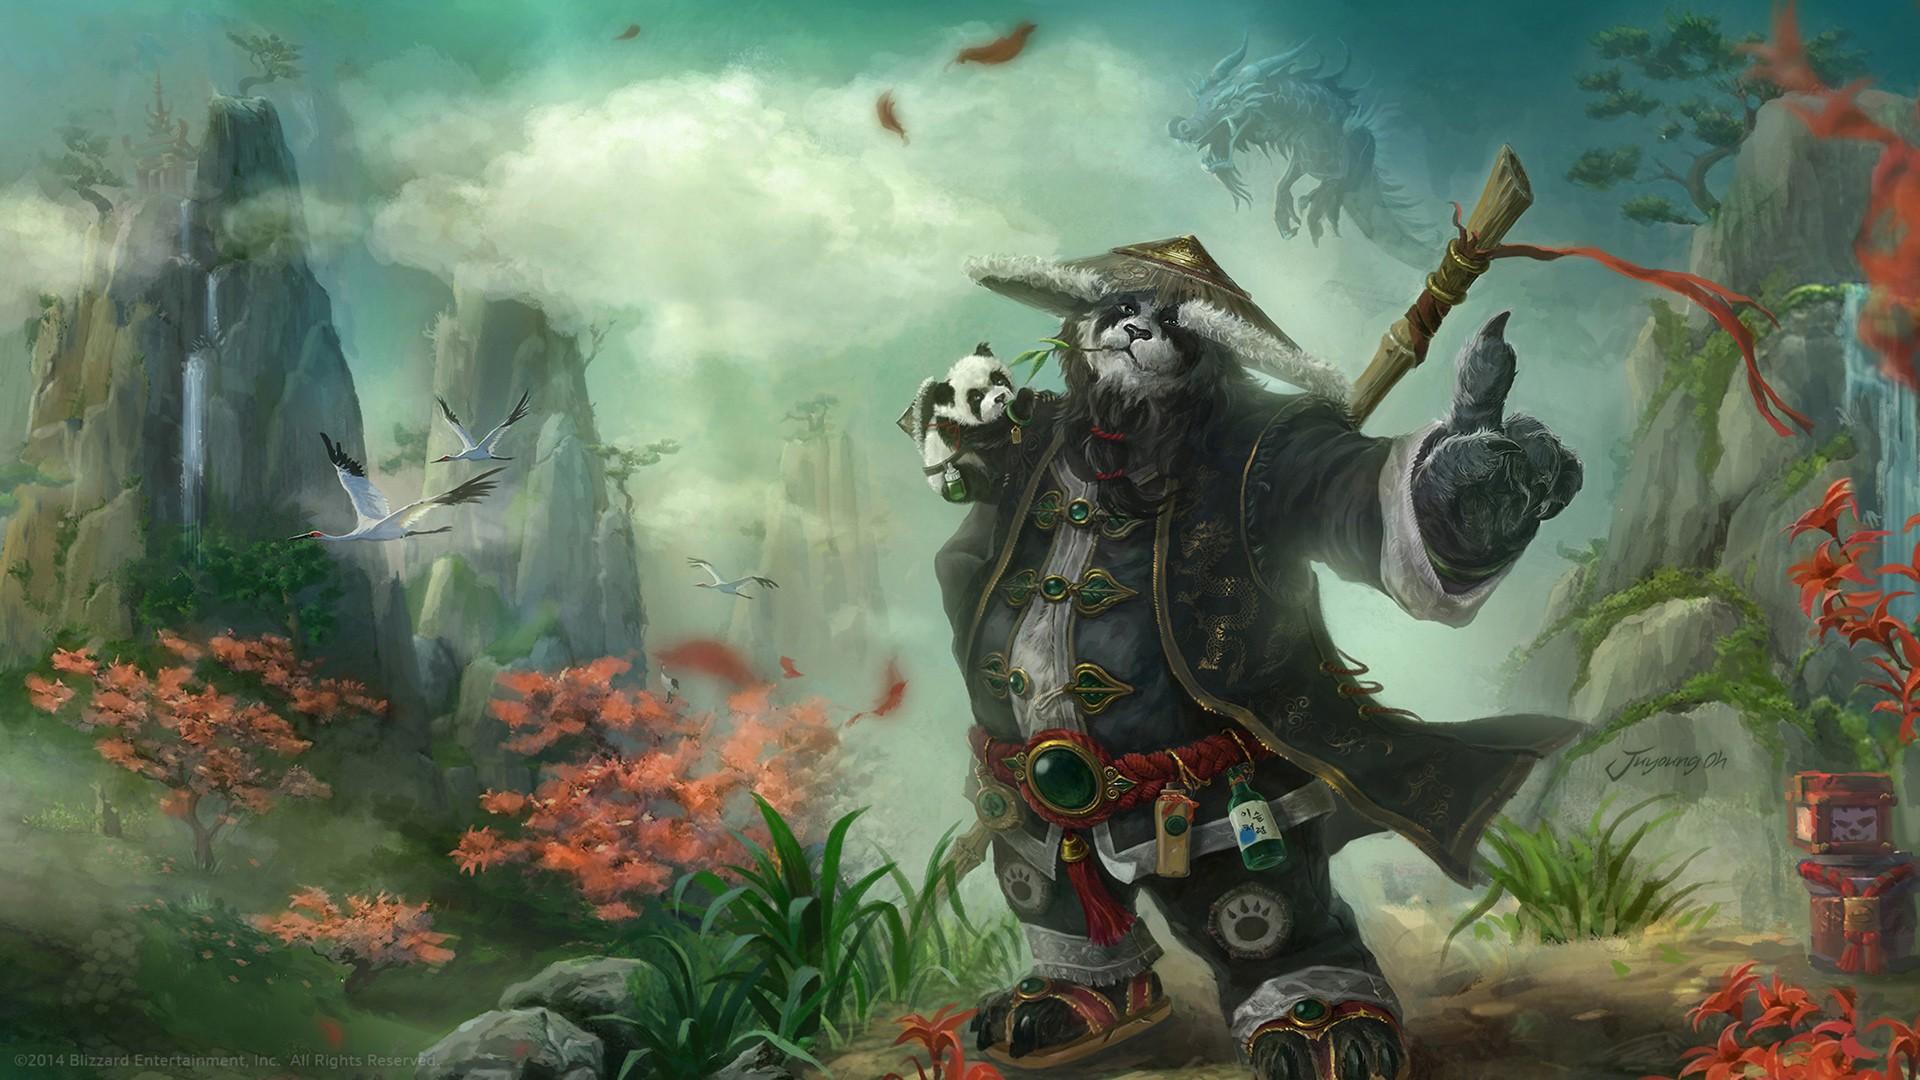 Jungle Wallpaper World Of Warcraft: Wallpaper : Painting, Video Games, World Of Warcraft